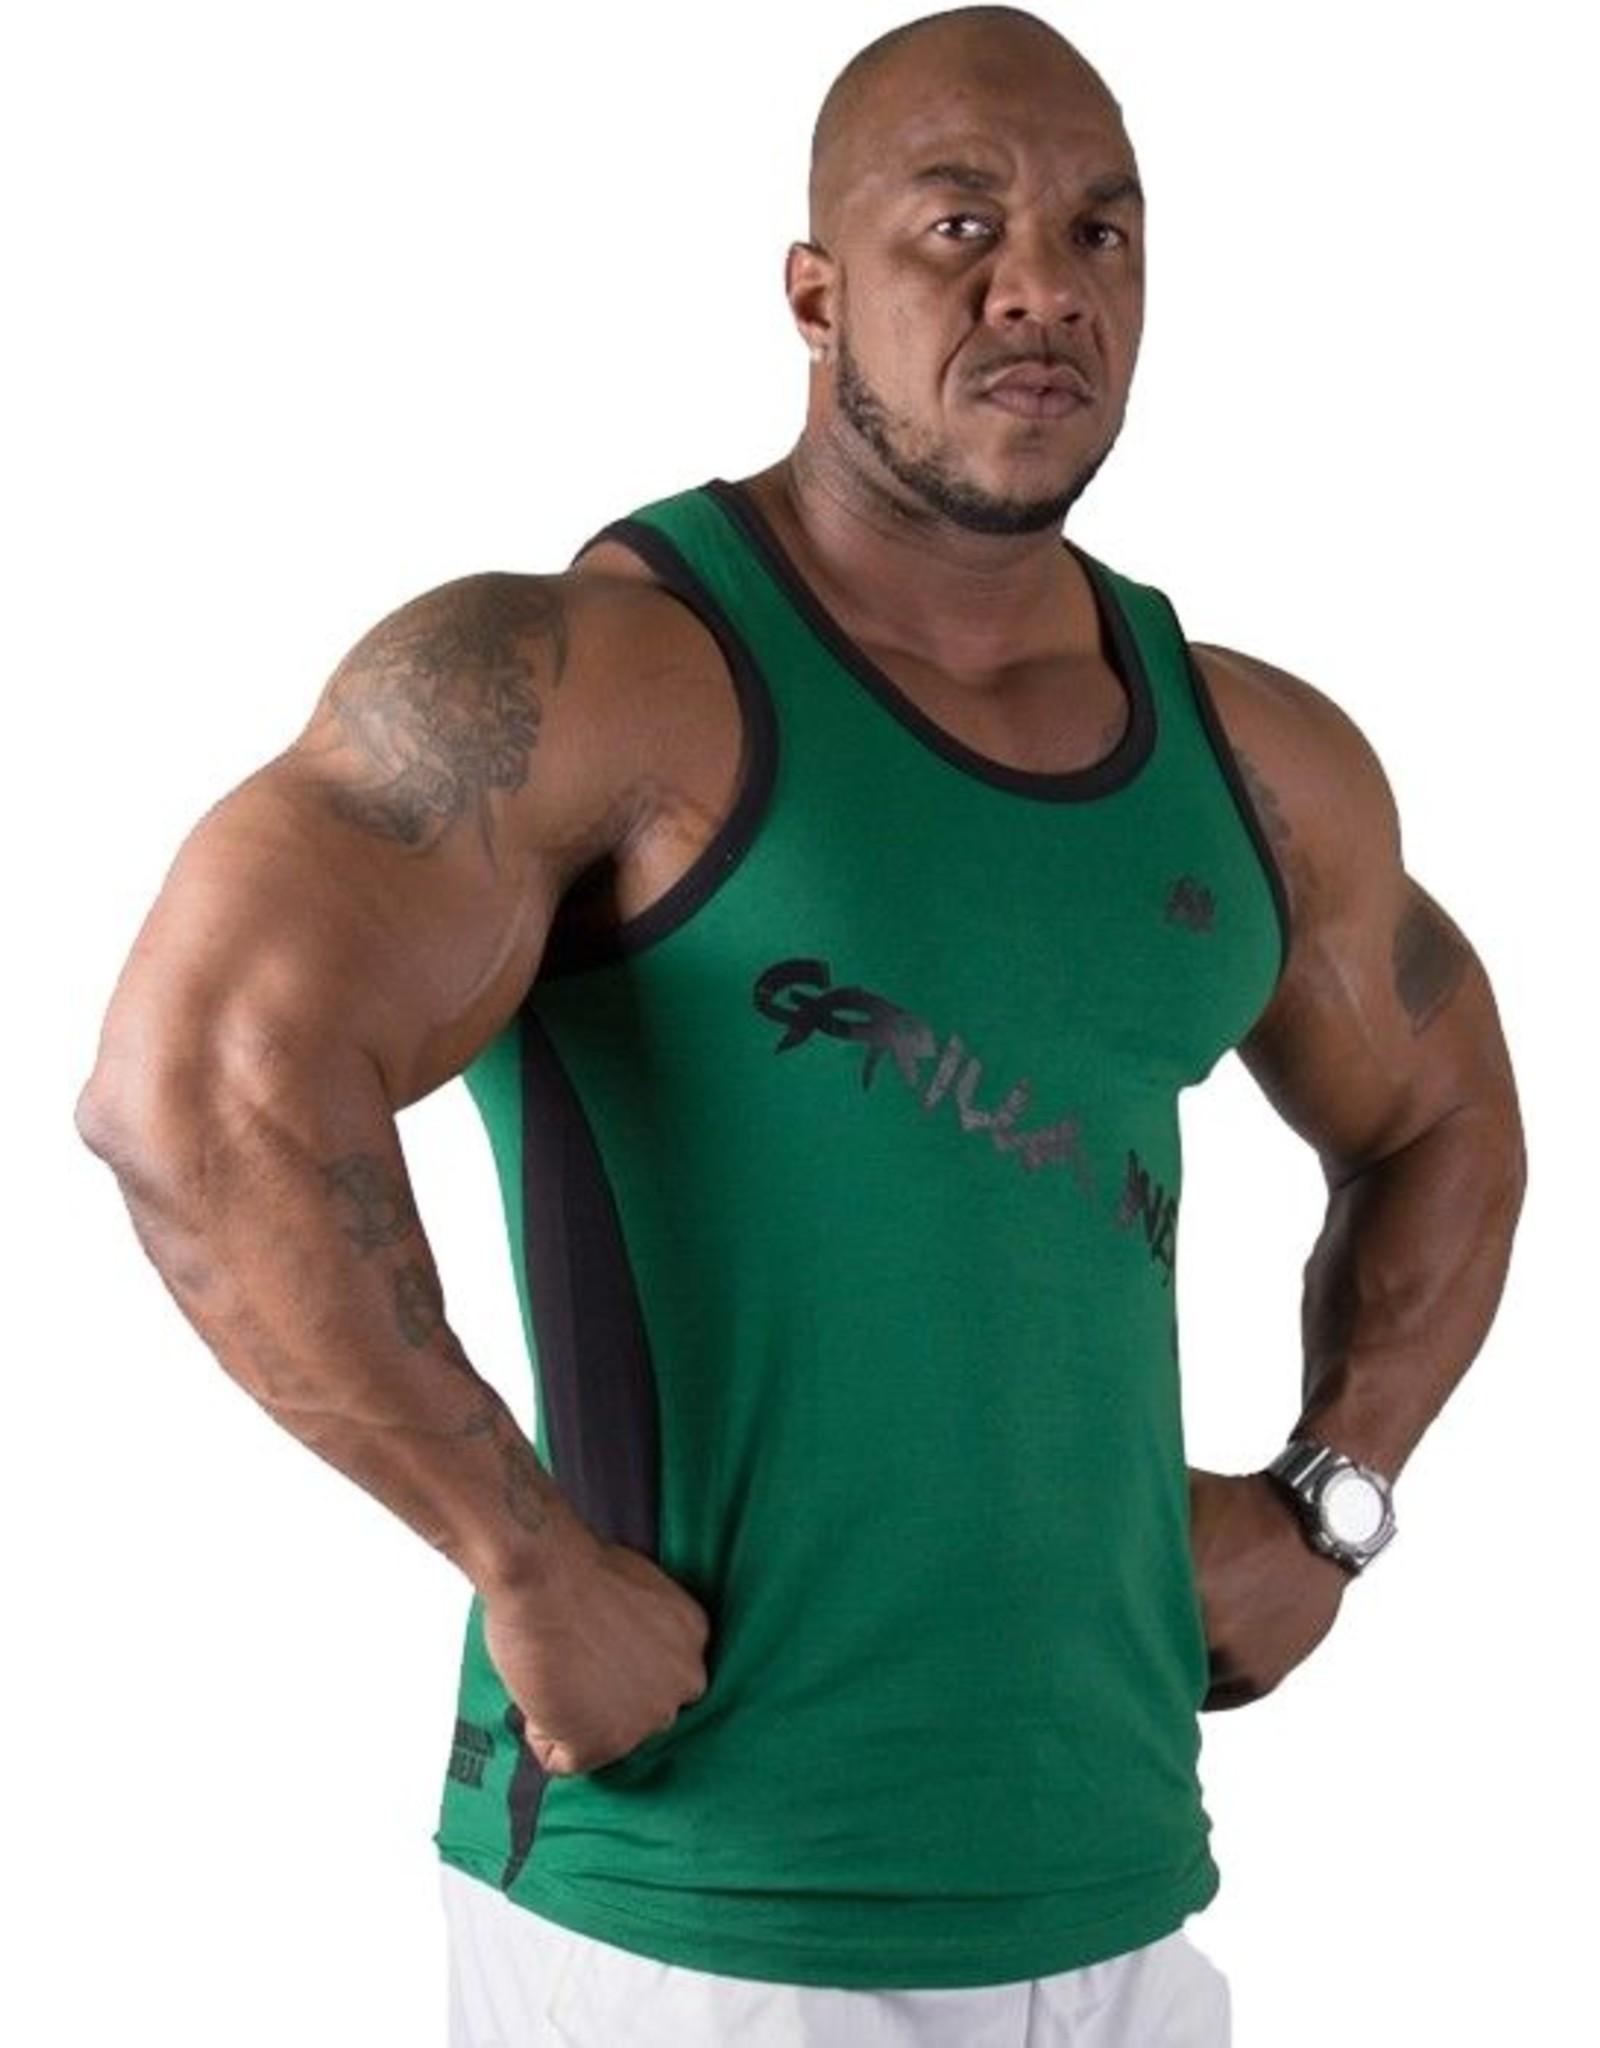 Gorilla Wear Stretch Tank Top - Green